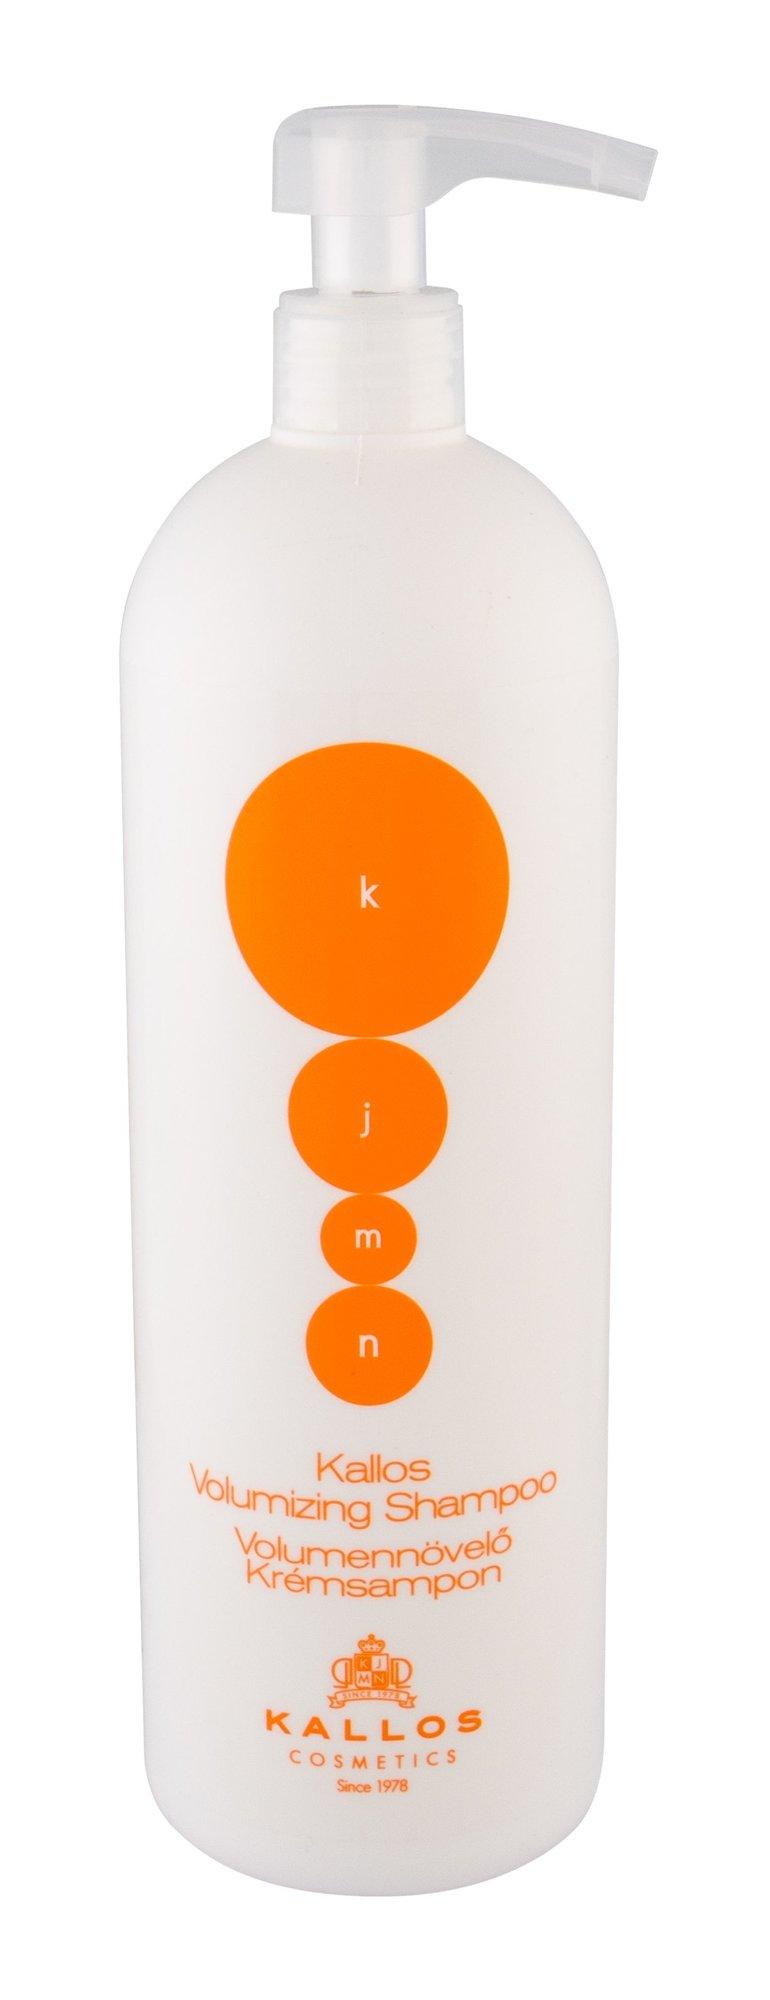 Kallos Cosmetics KJMN Shampoo 1000ml